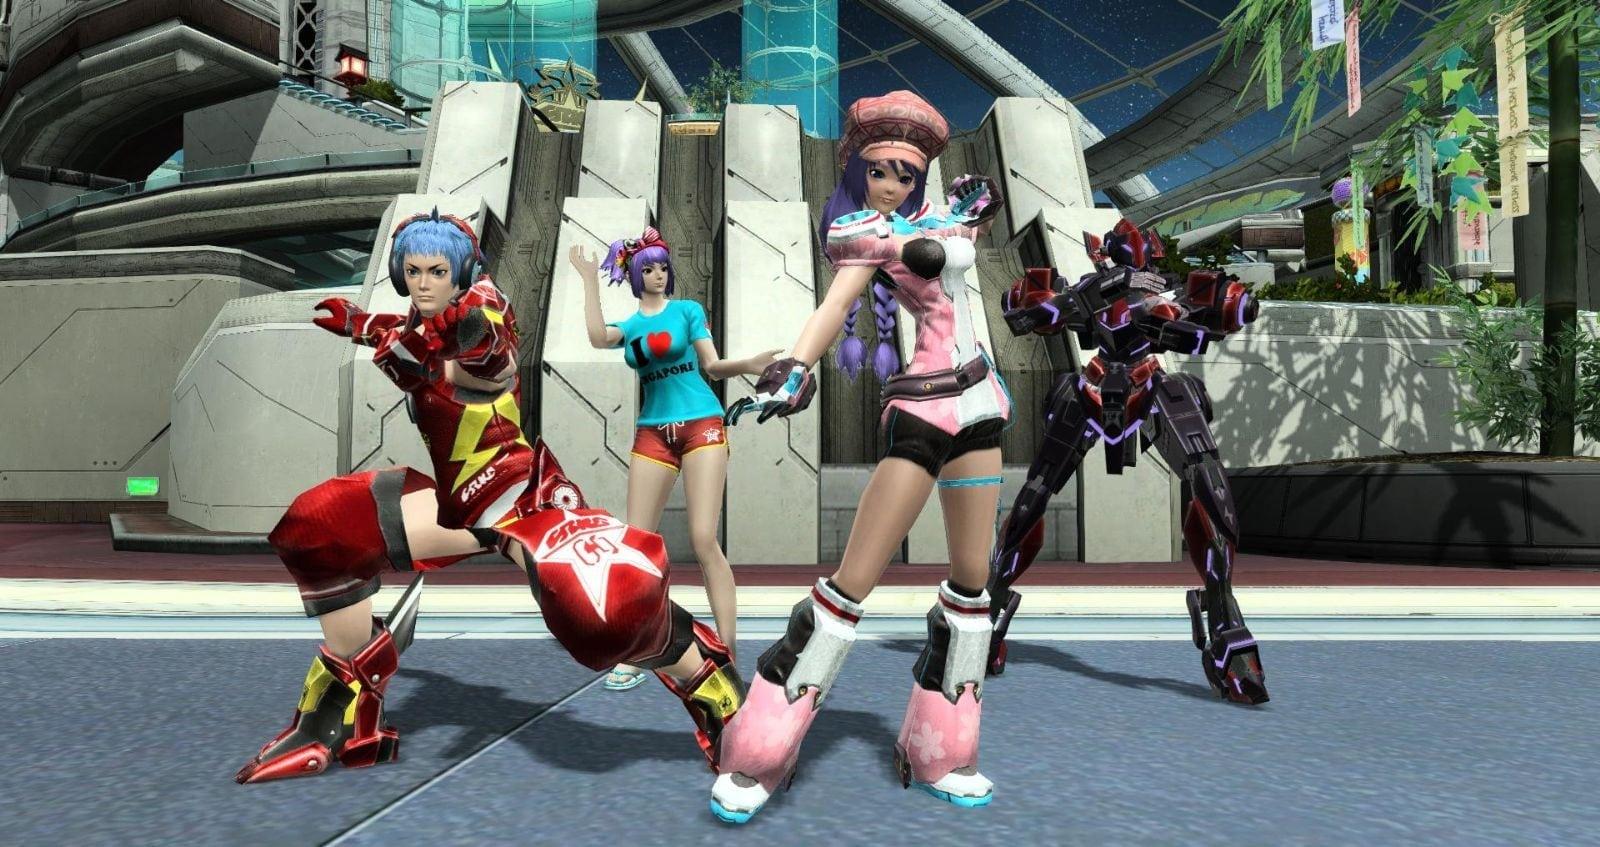 Phantasy Star Online 2 SEA - Summer costumes 1